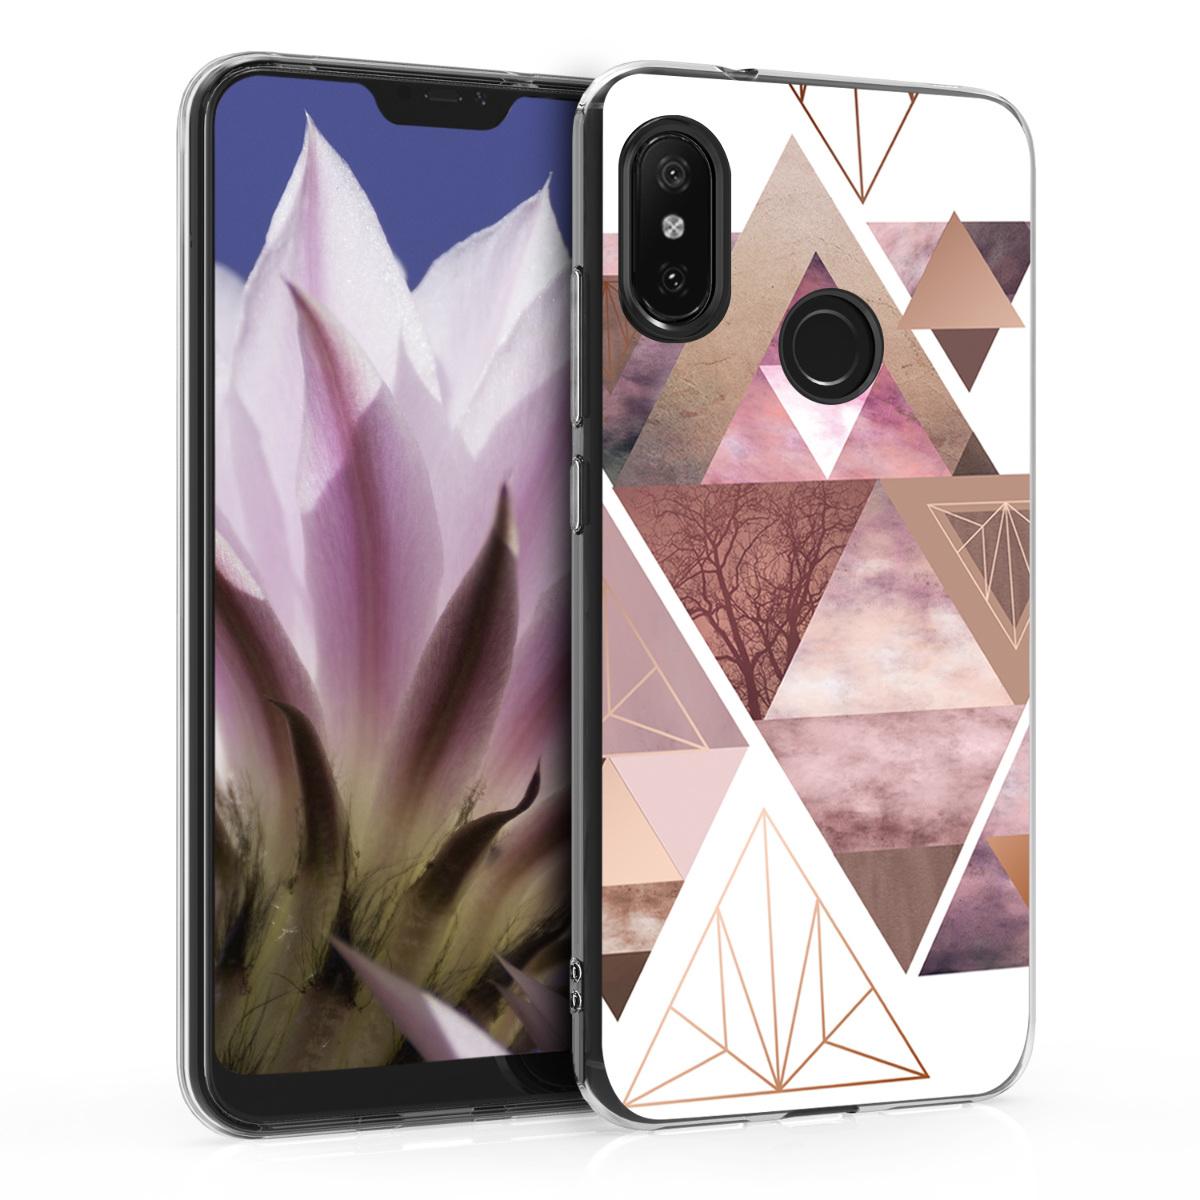 Kvalitní silikonové TPU pouzdro | obal pro Xiaomi Redmi 6 Pro | Mi A2 Lite - Patchwork trojúhelníky Light růžový / starorůžový růžovýgold / bílý